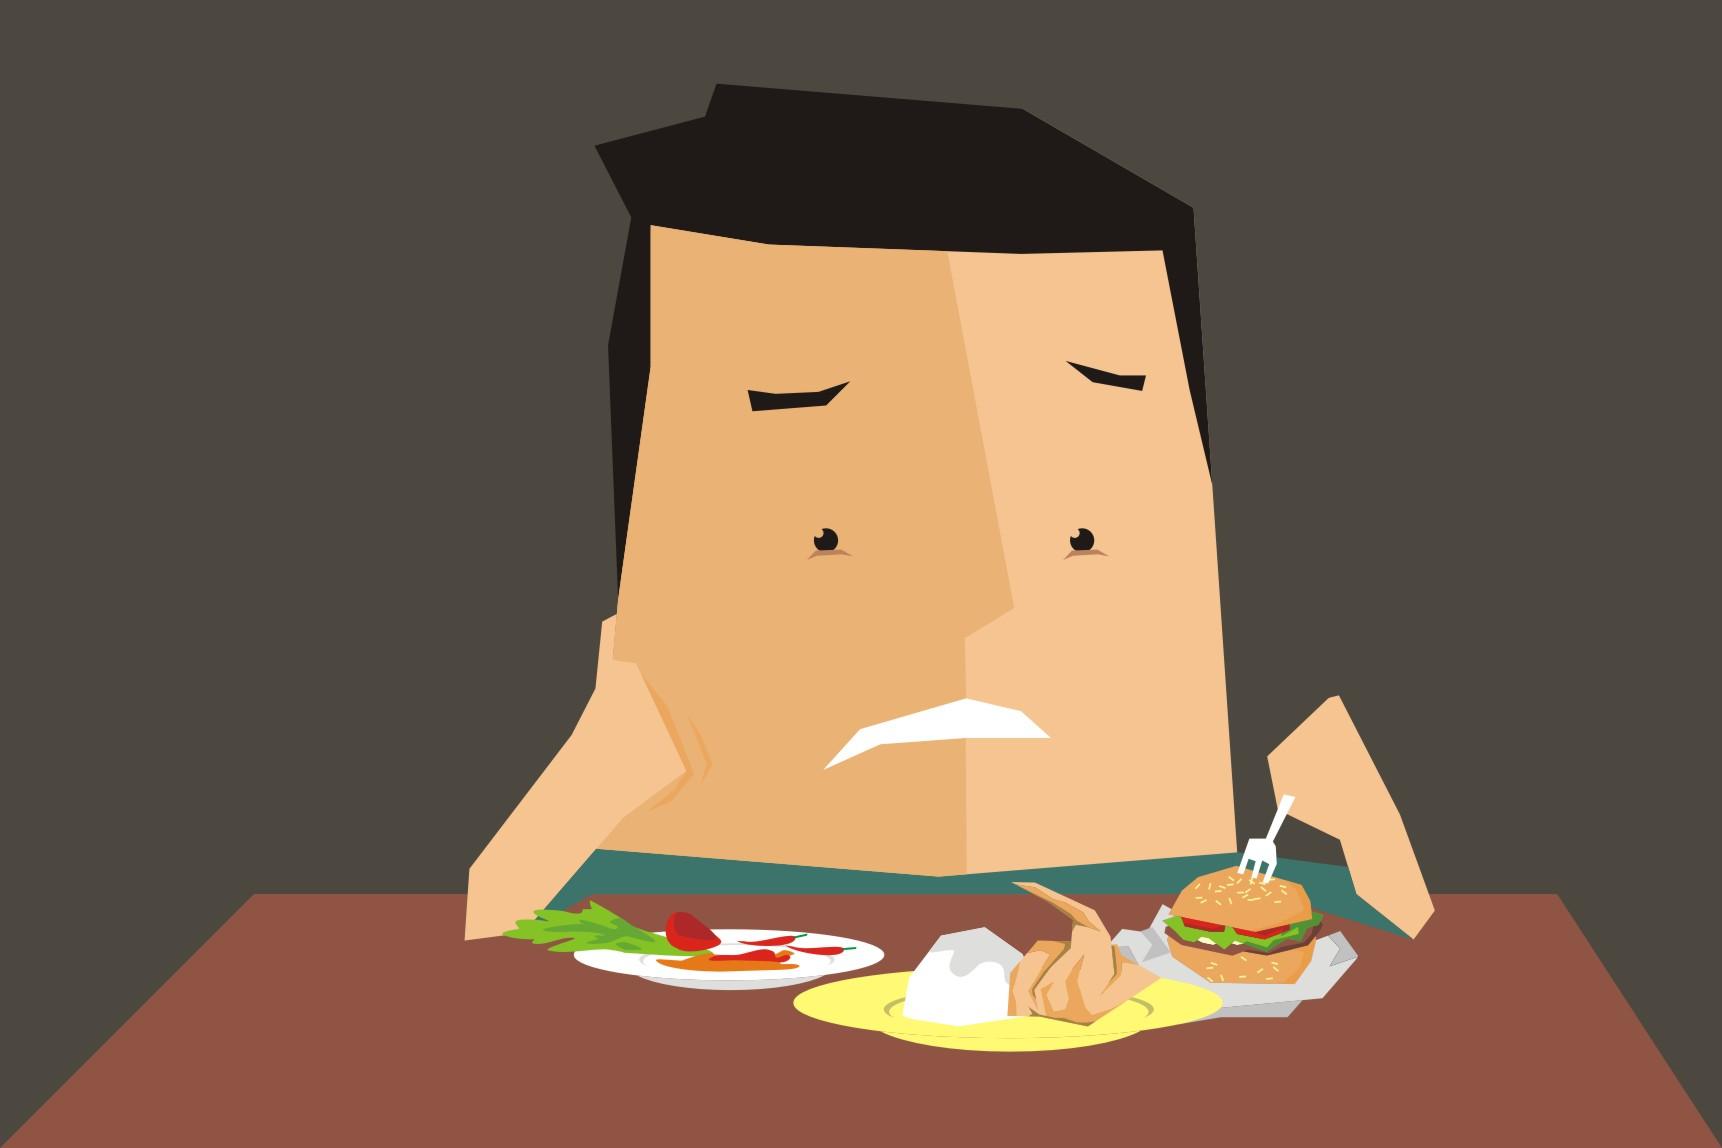 Sering migrain? Kamu wajib hindari 7 makanan ini